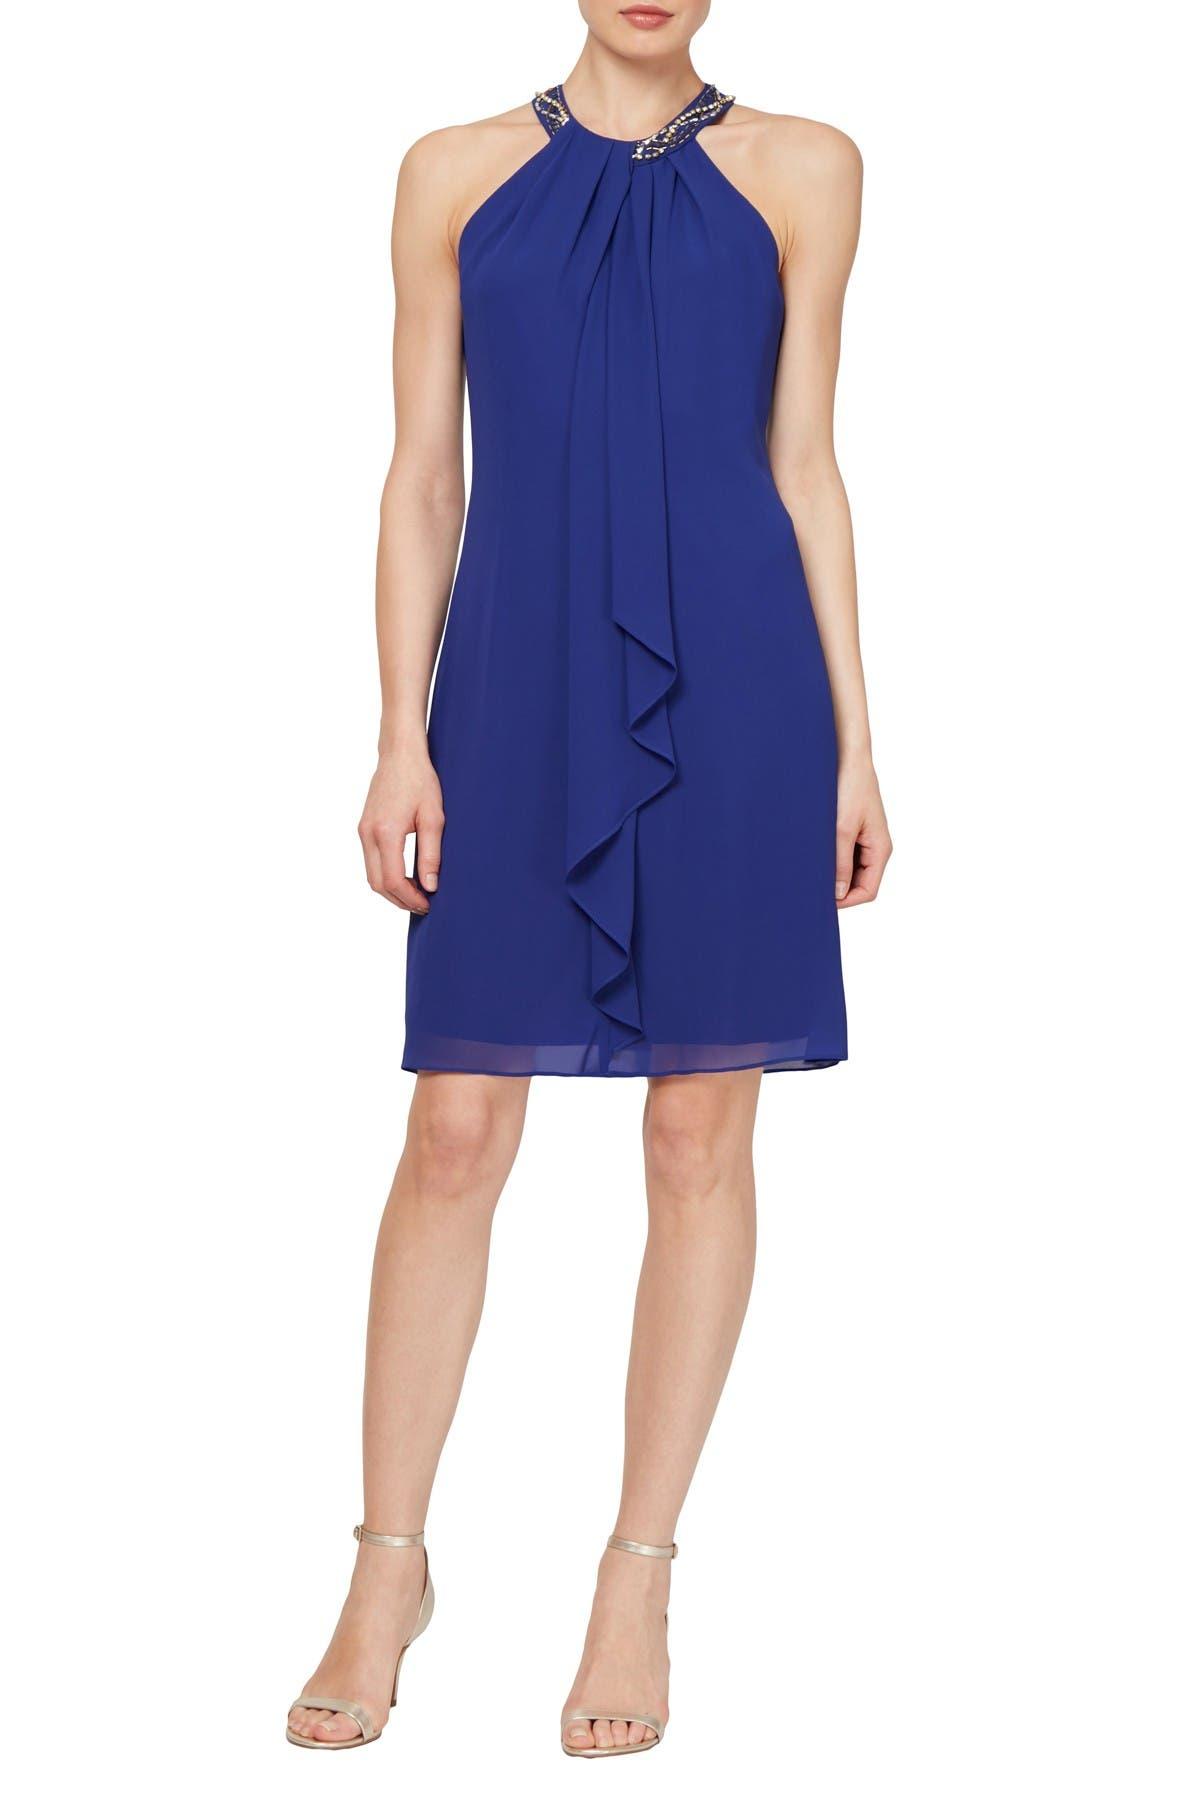 Image of SLNY Bead Braided Halter Chiffon Dress